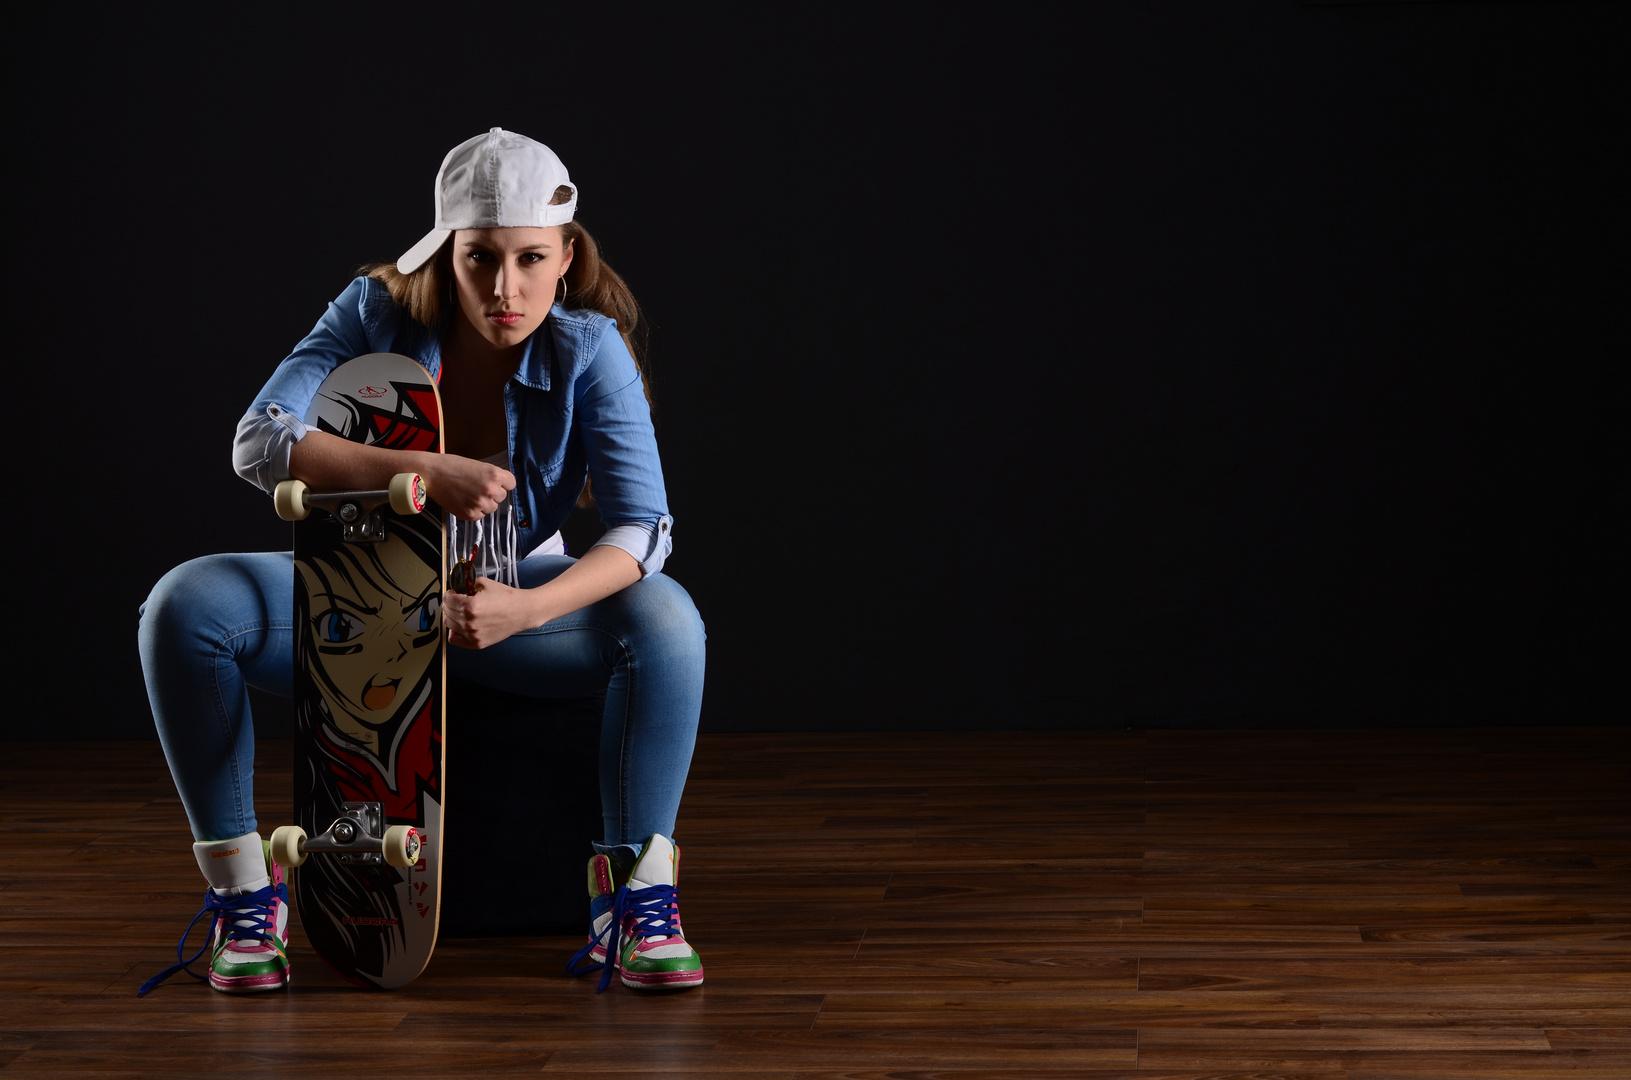 Julia, cool mit Skateboard